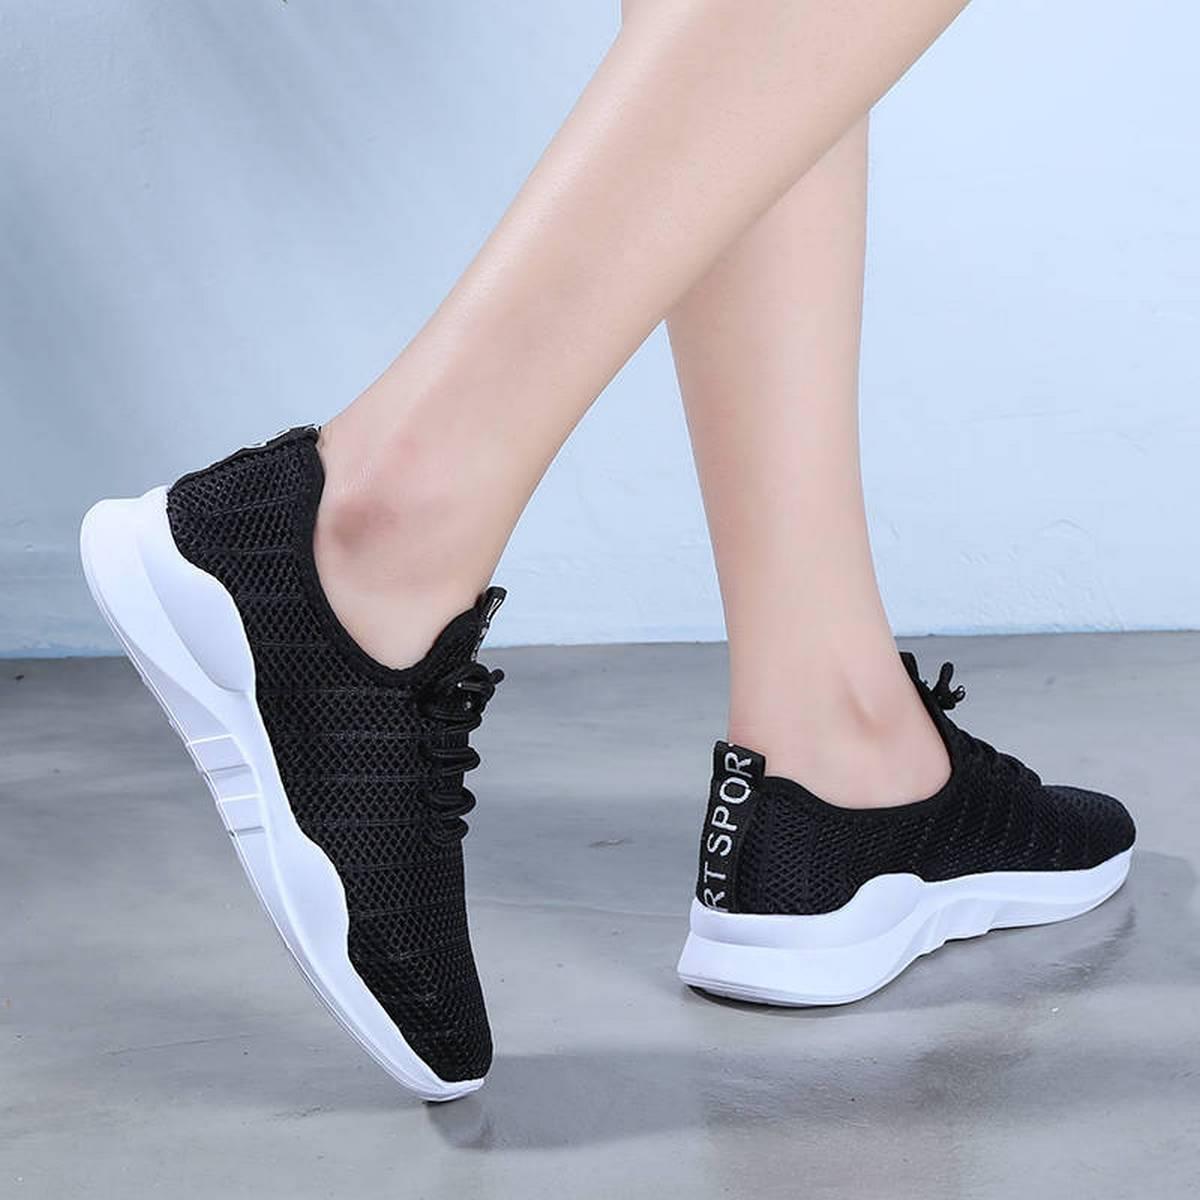 Flats shoes for women Leopard Print sport Sandals summer Boots Casual